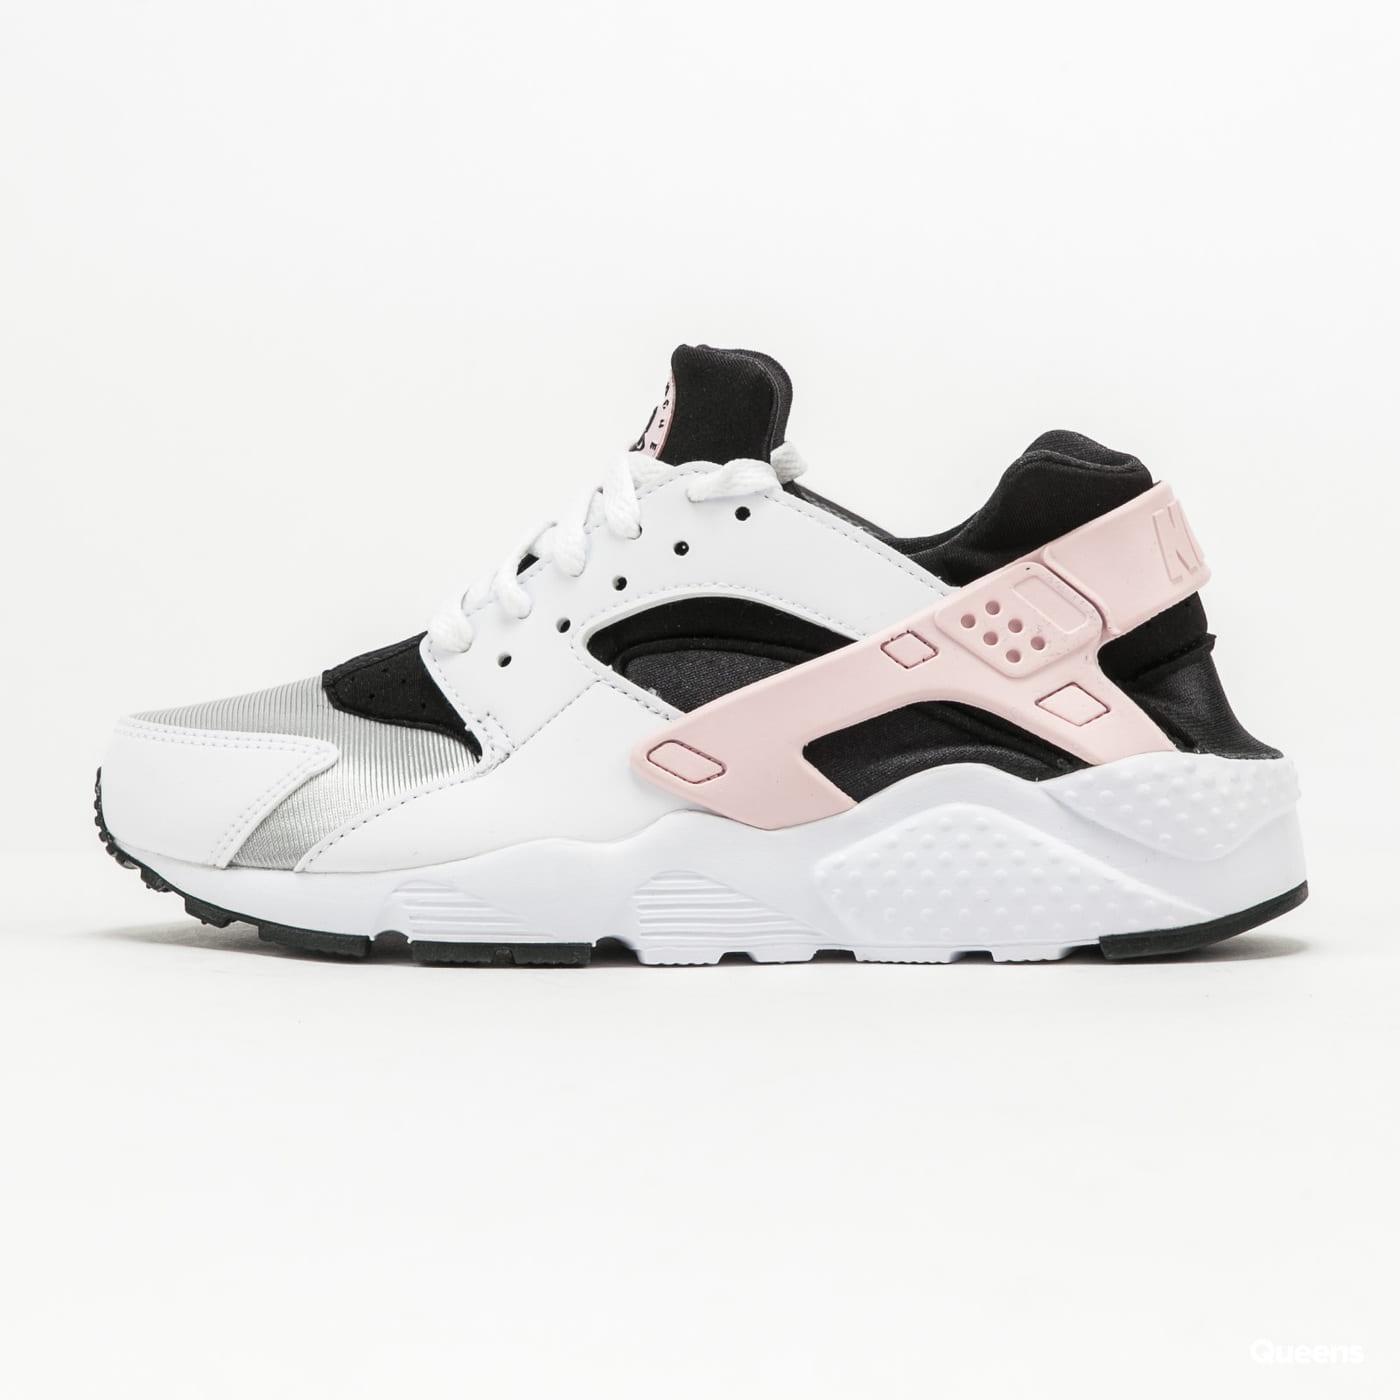 Nike Huarache Run (GS) white / pink foam - grey fog